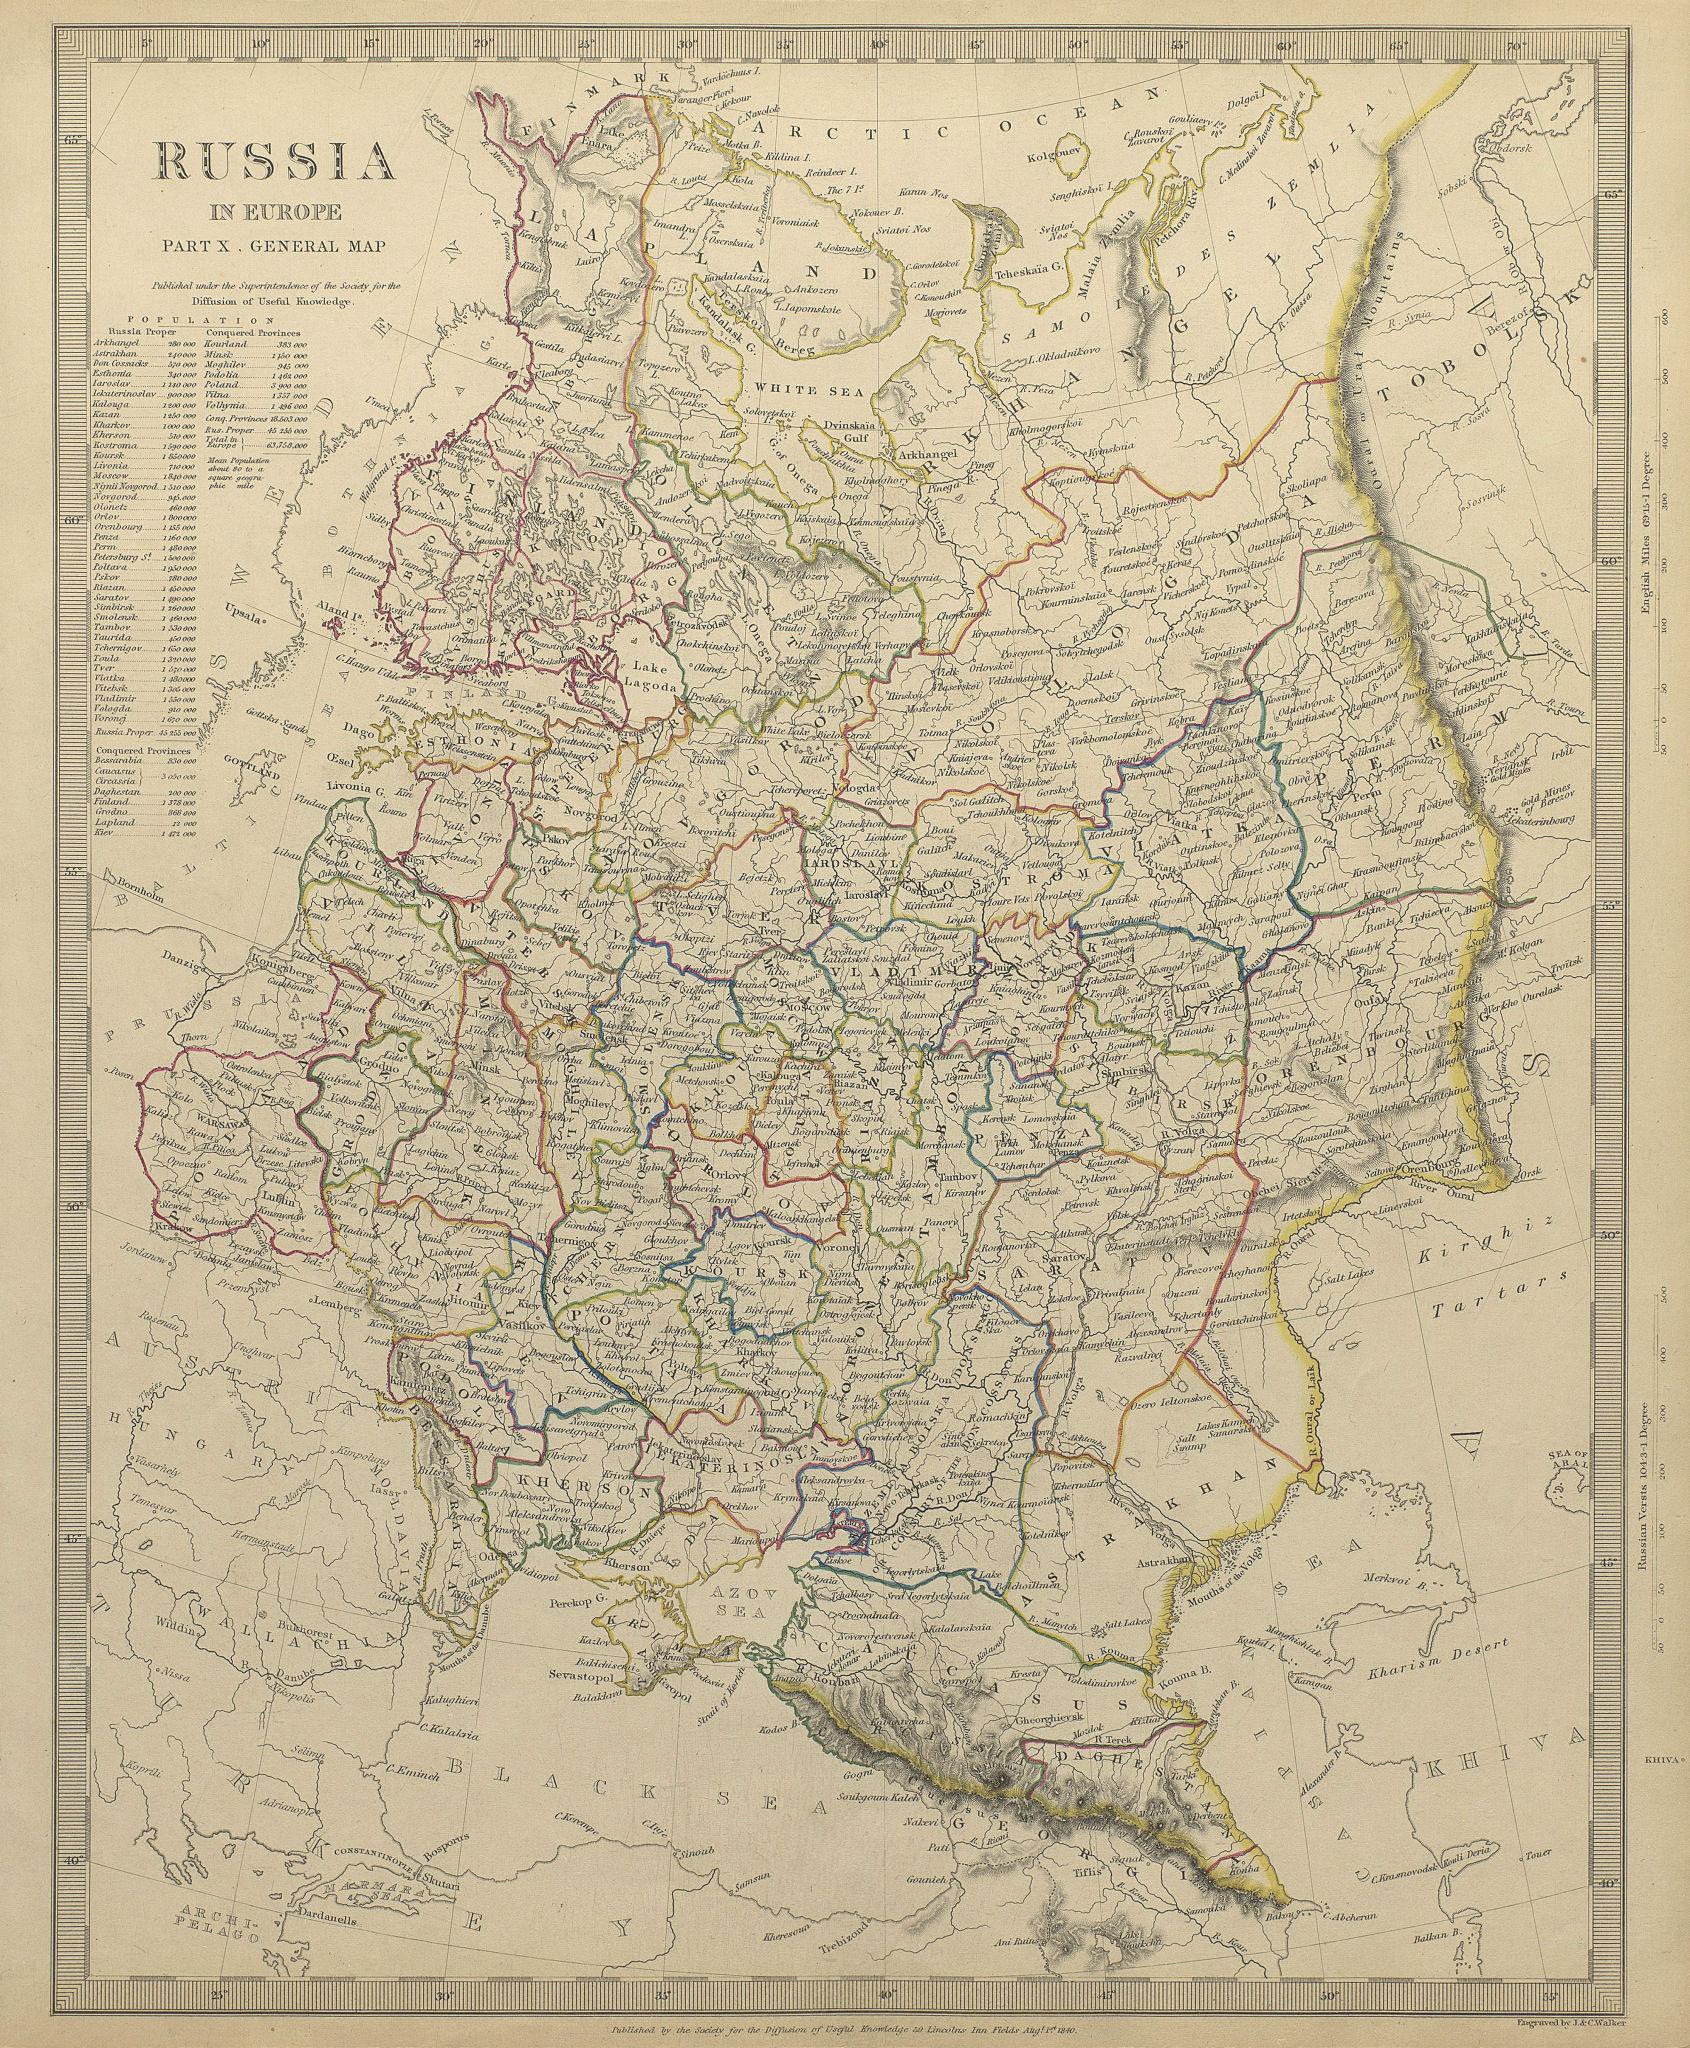 Associate Product RUSSIA. Eastern Europe. Ukraine Belarus Baltics Finland Georgia. SDUK 1844 map